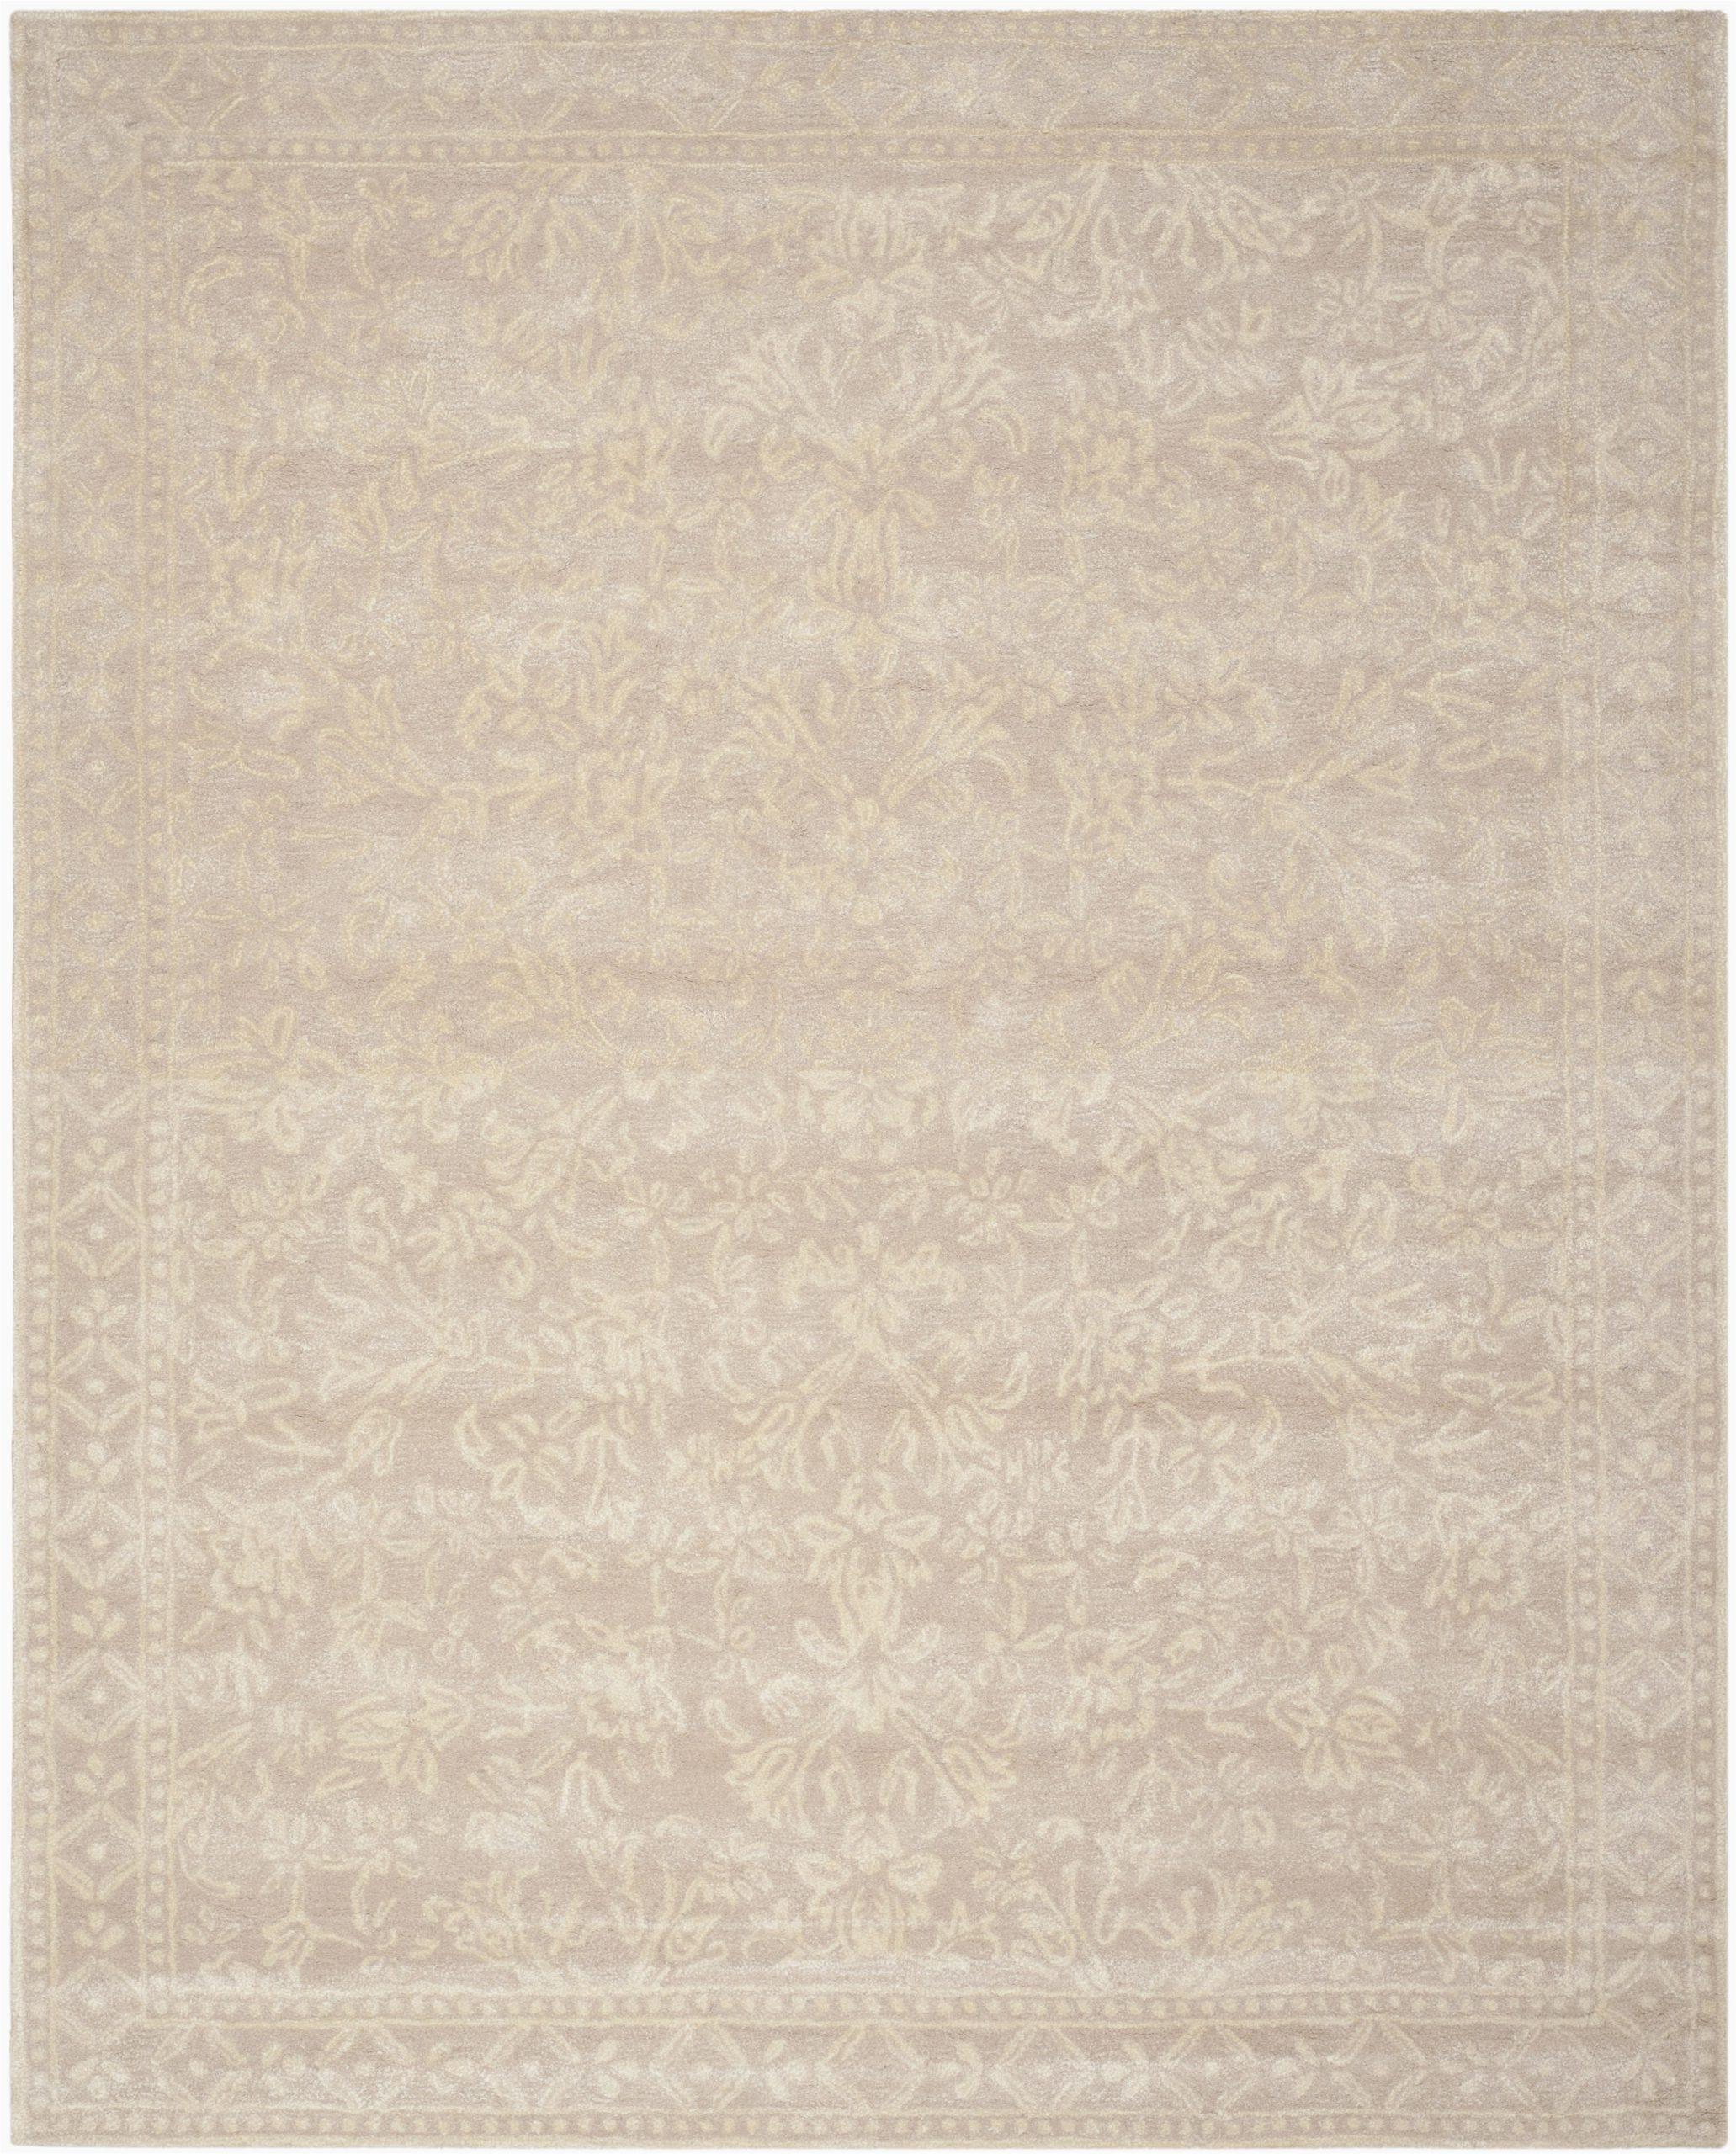 martha stewart hand tufted ivorybeige area rug